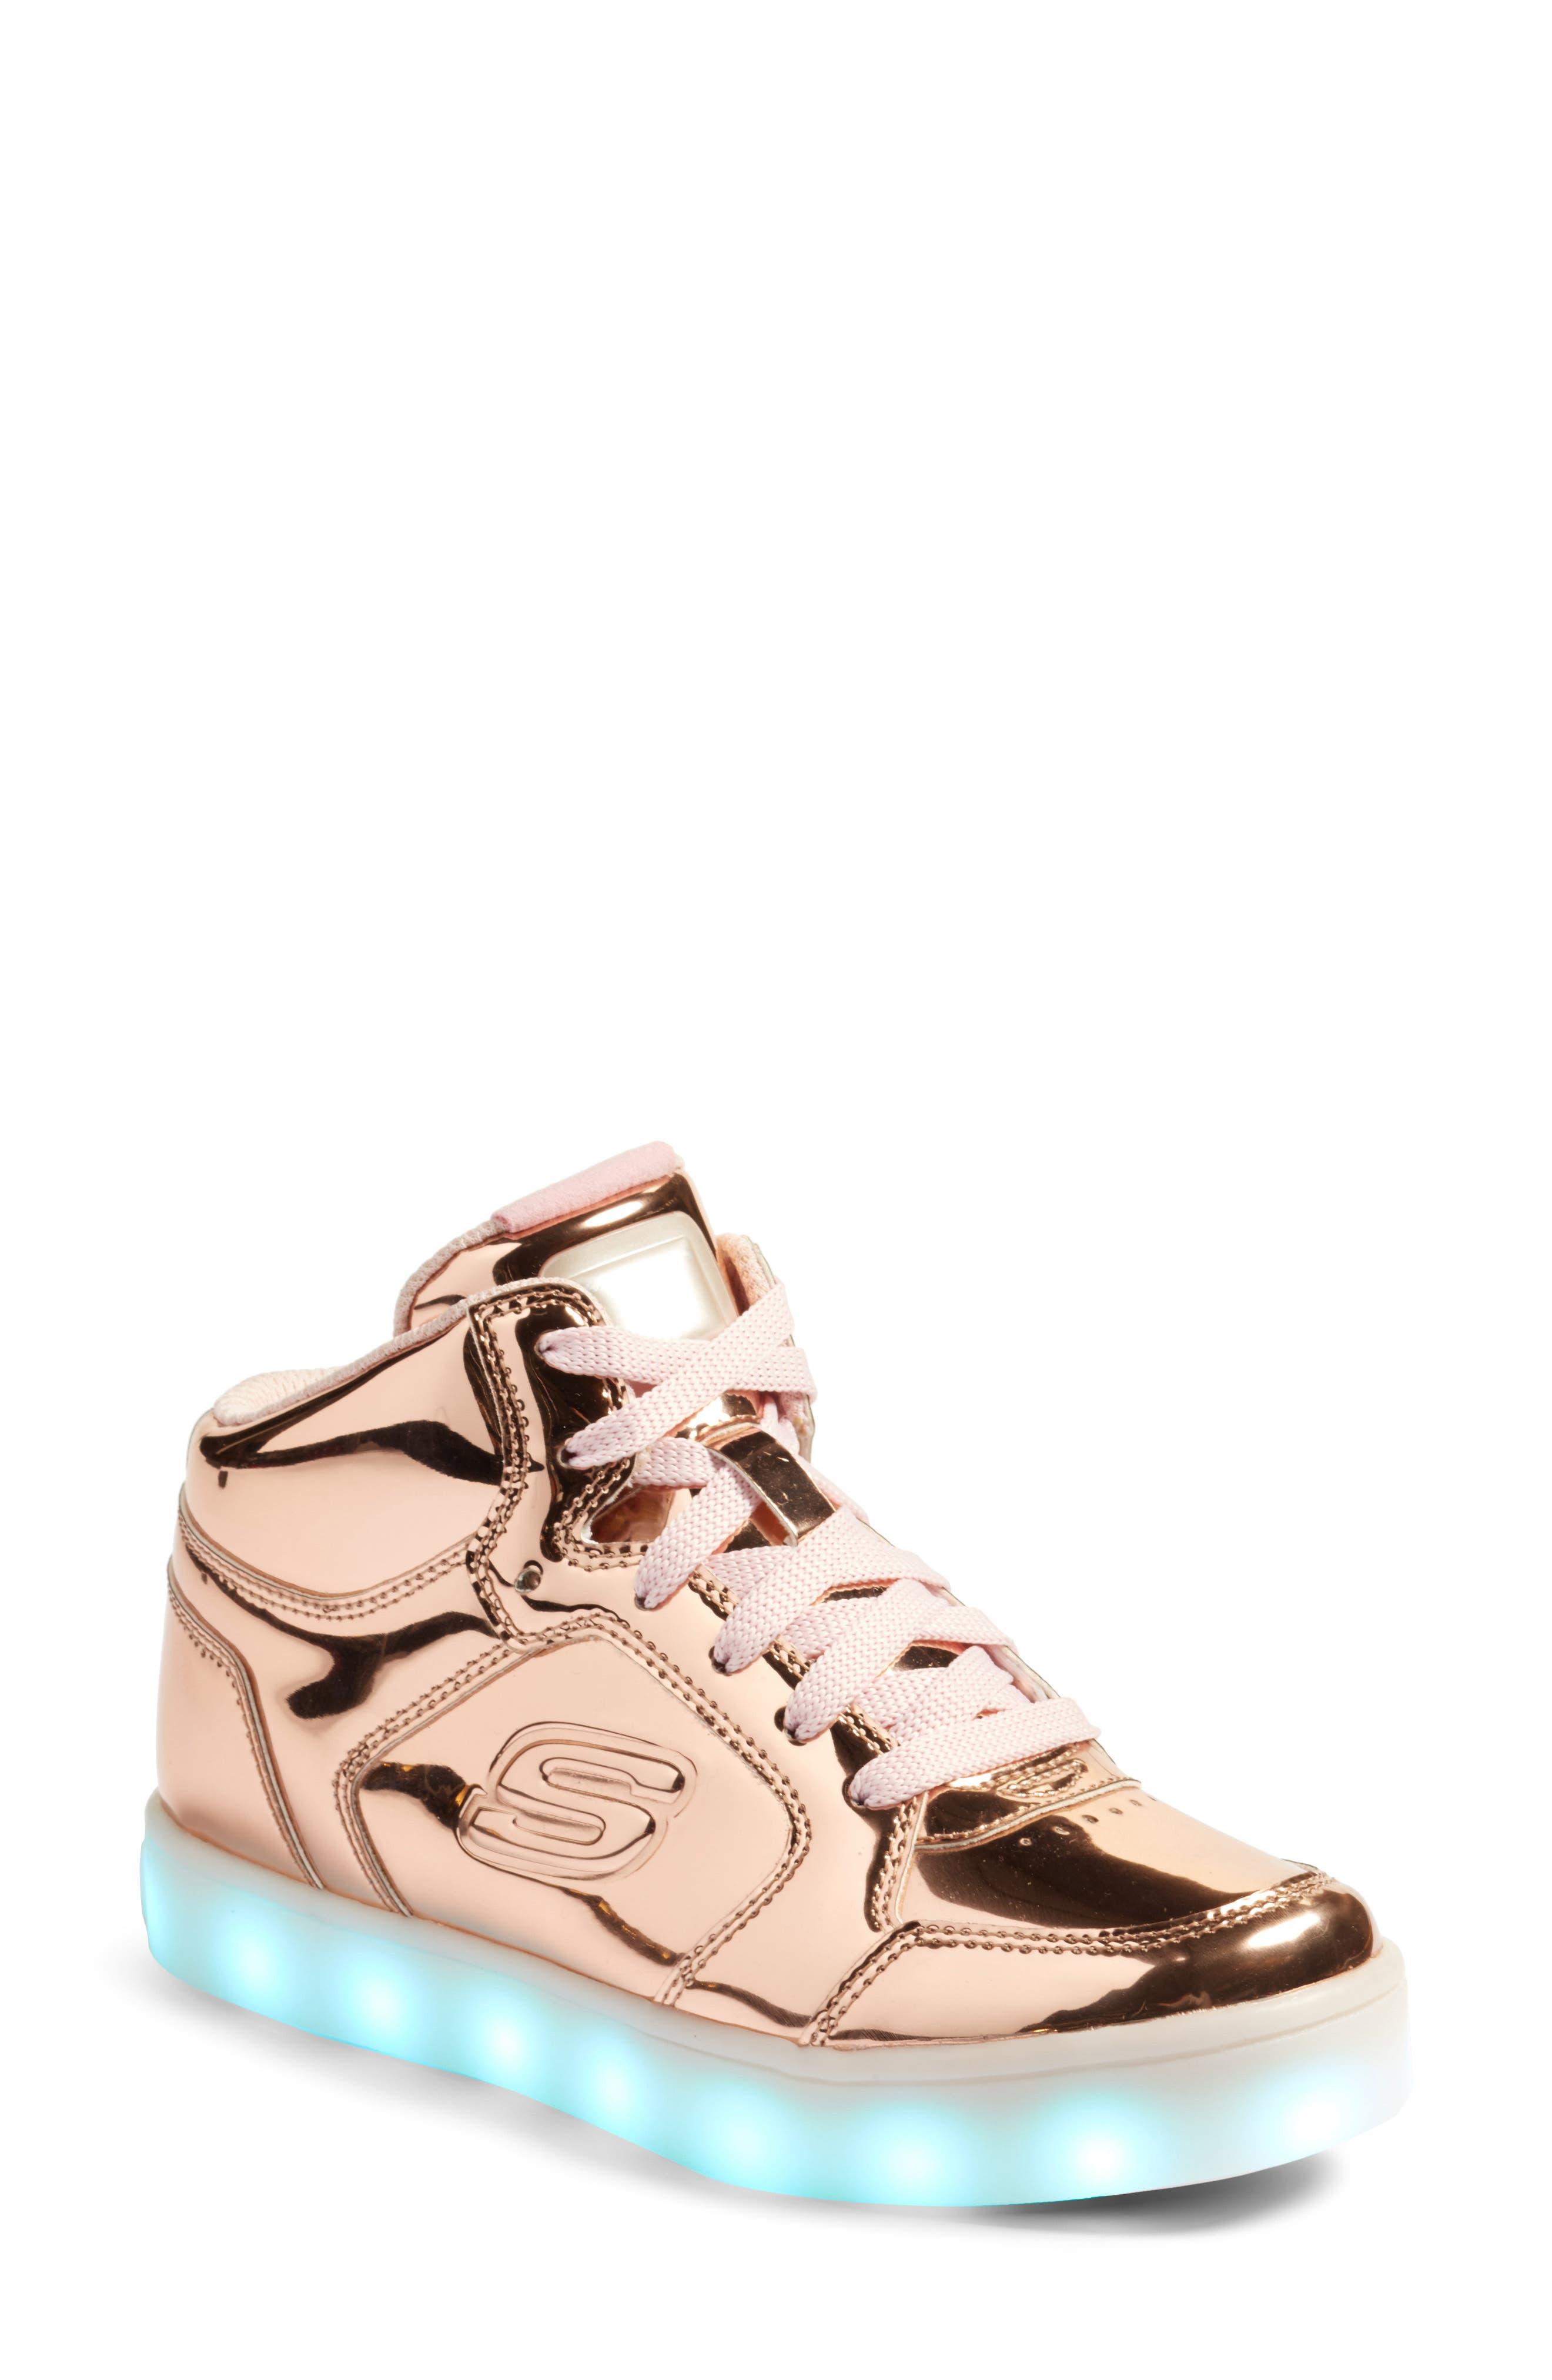 Energy Lights Metallic High Top Sneaker,                             Main thumbnail 1, color,                             Rose Gold